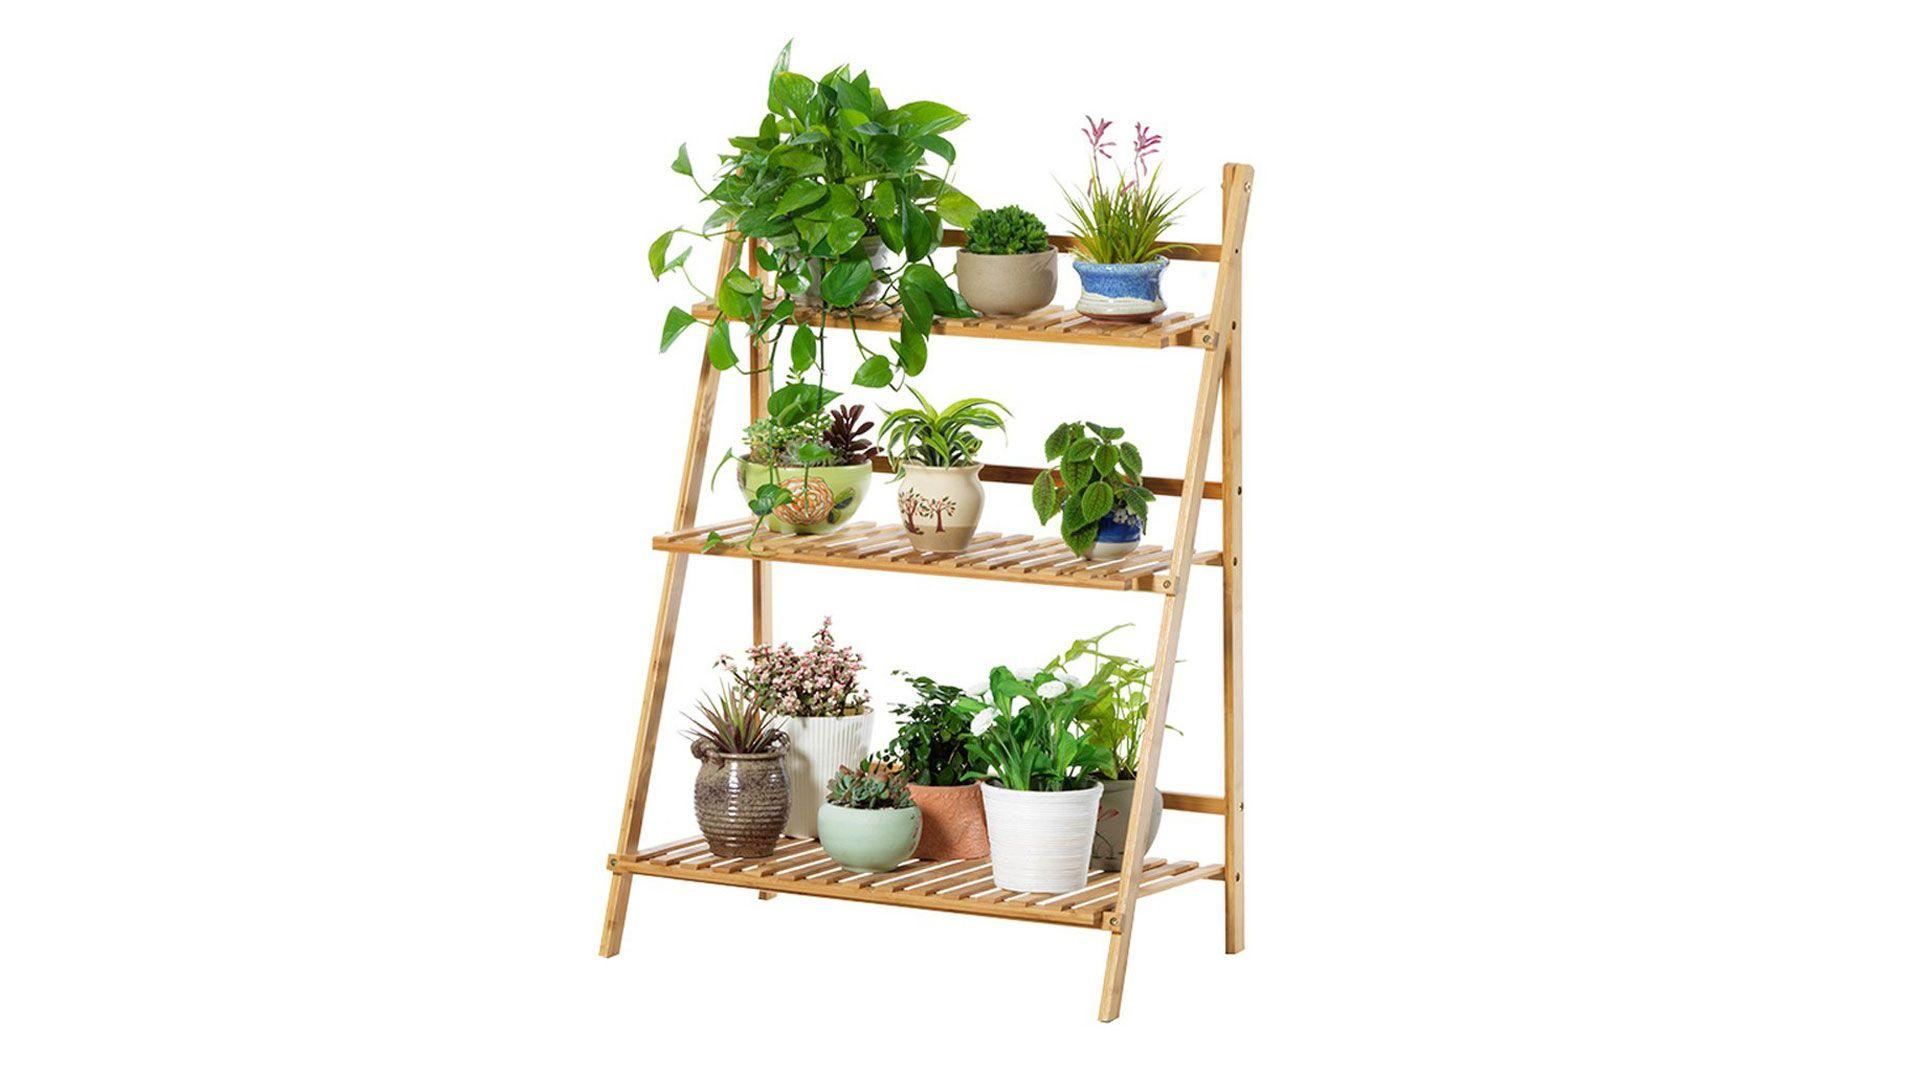 Mueble para jardineras